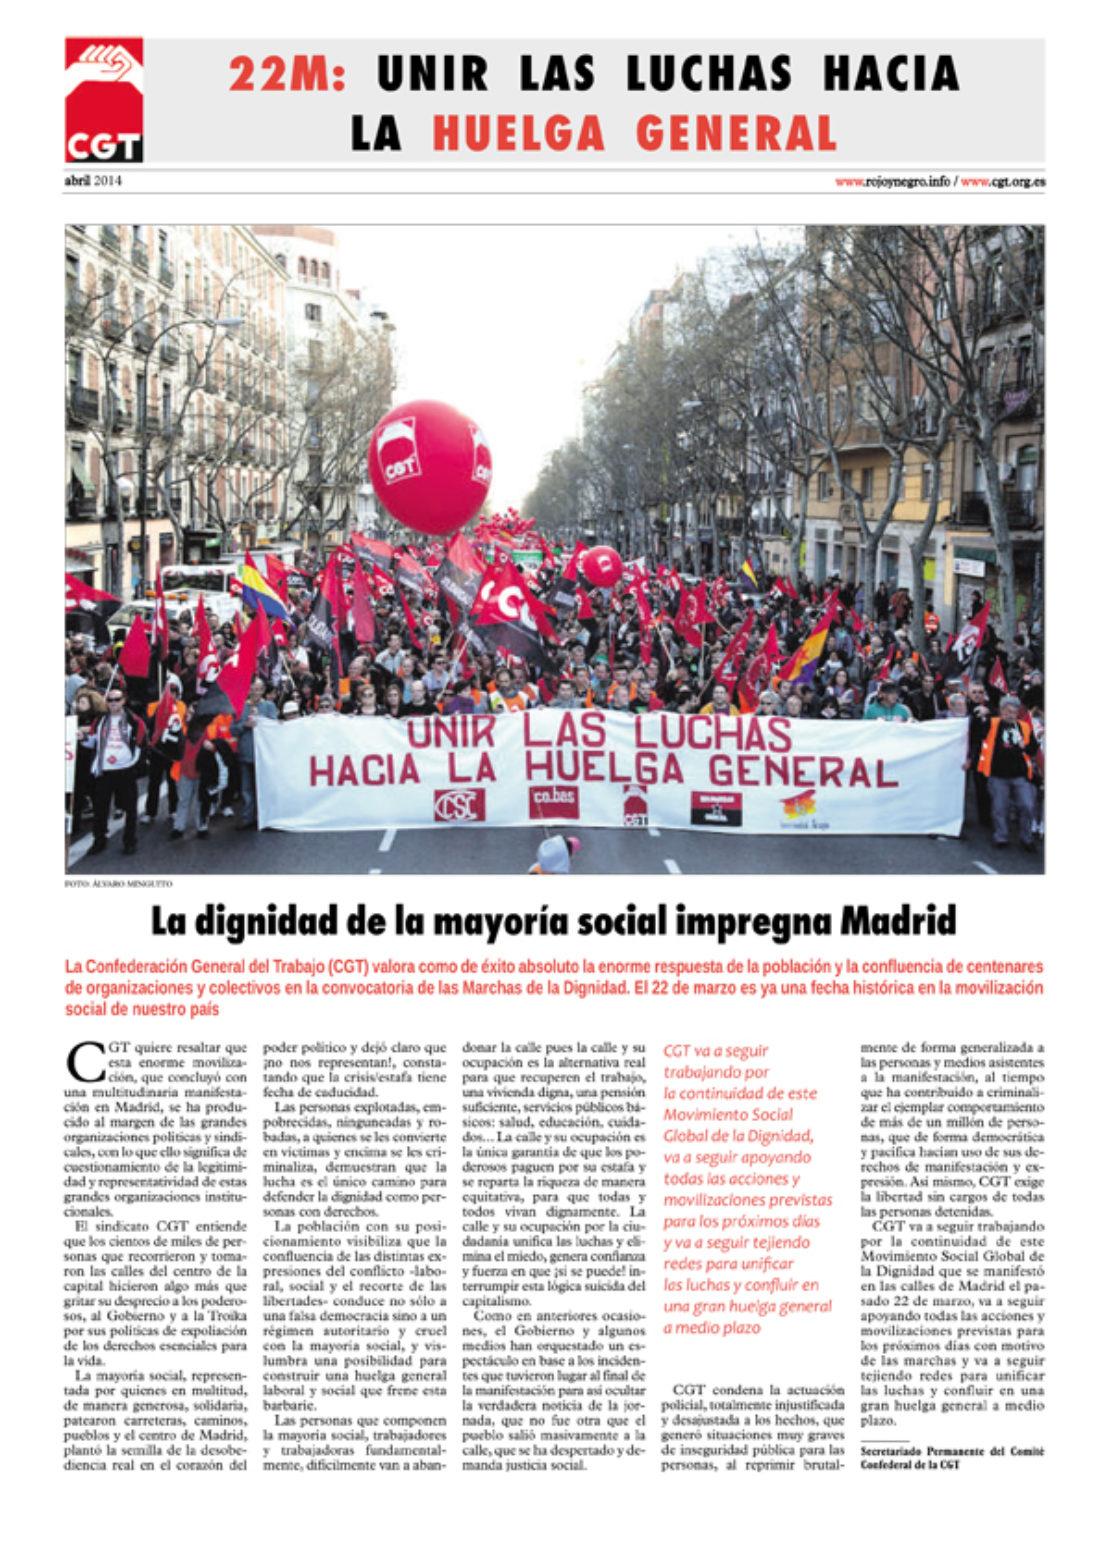 22M: Unir las luchas hacia la Huelga General